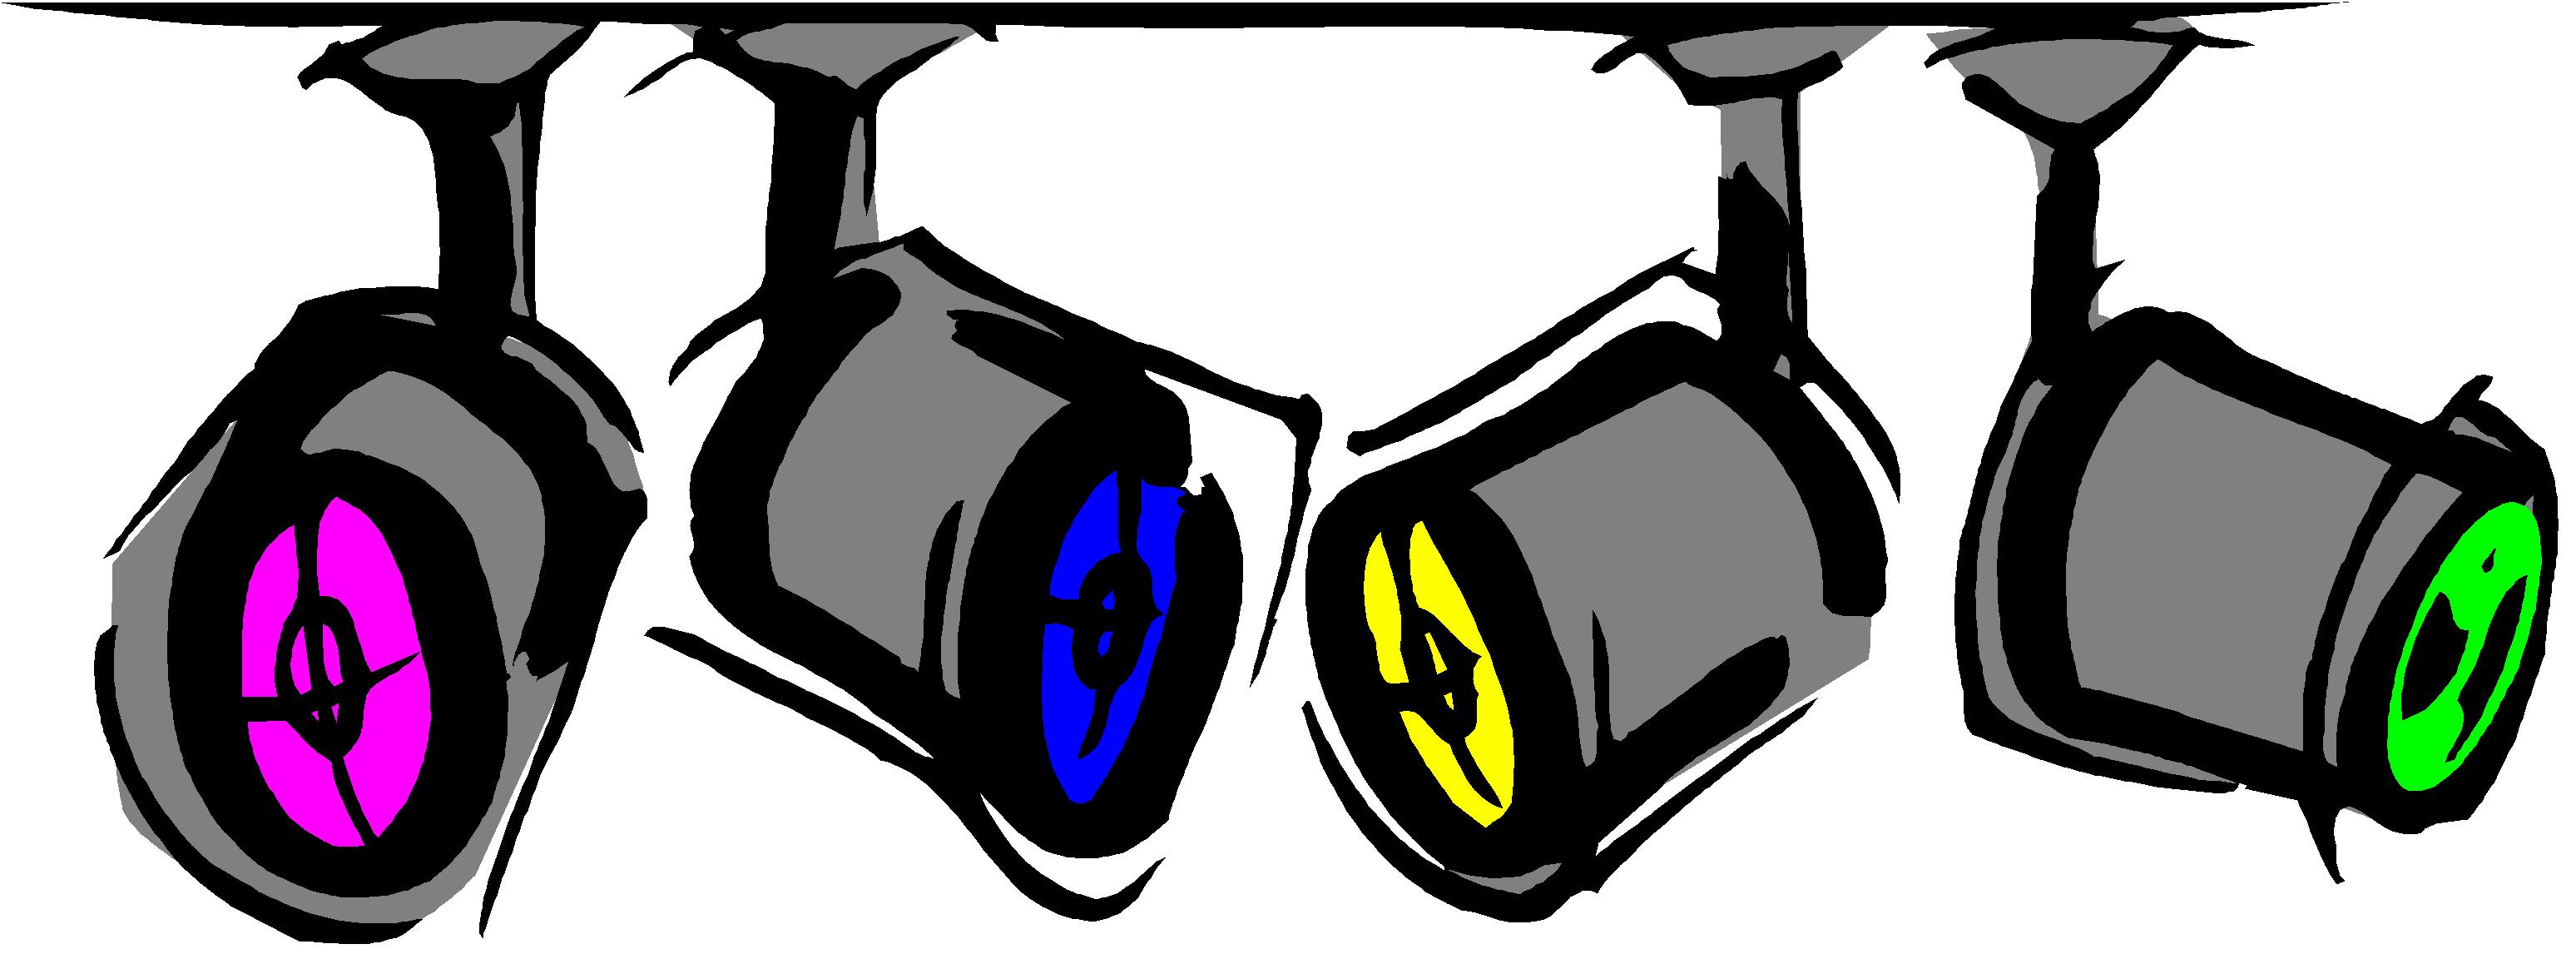 3096x1146 Free Hollywood Spotlight Clipart Creative Clipartllection